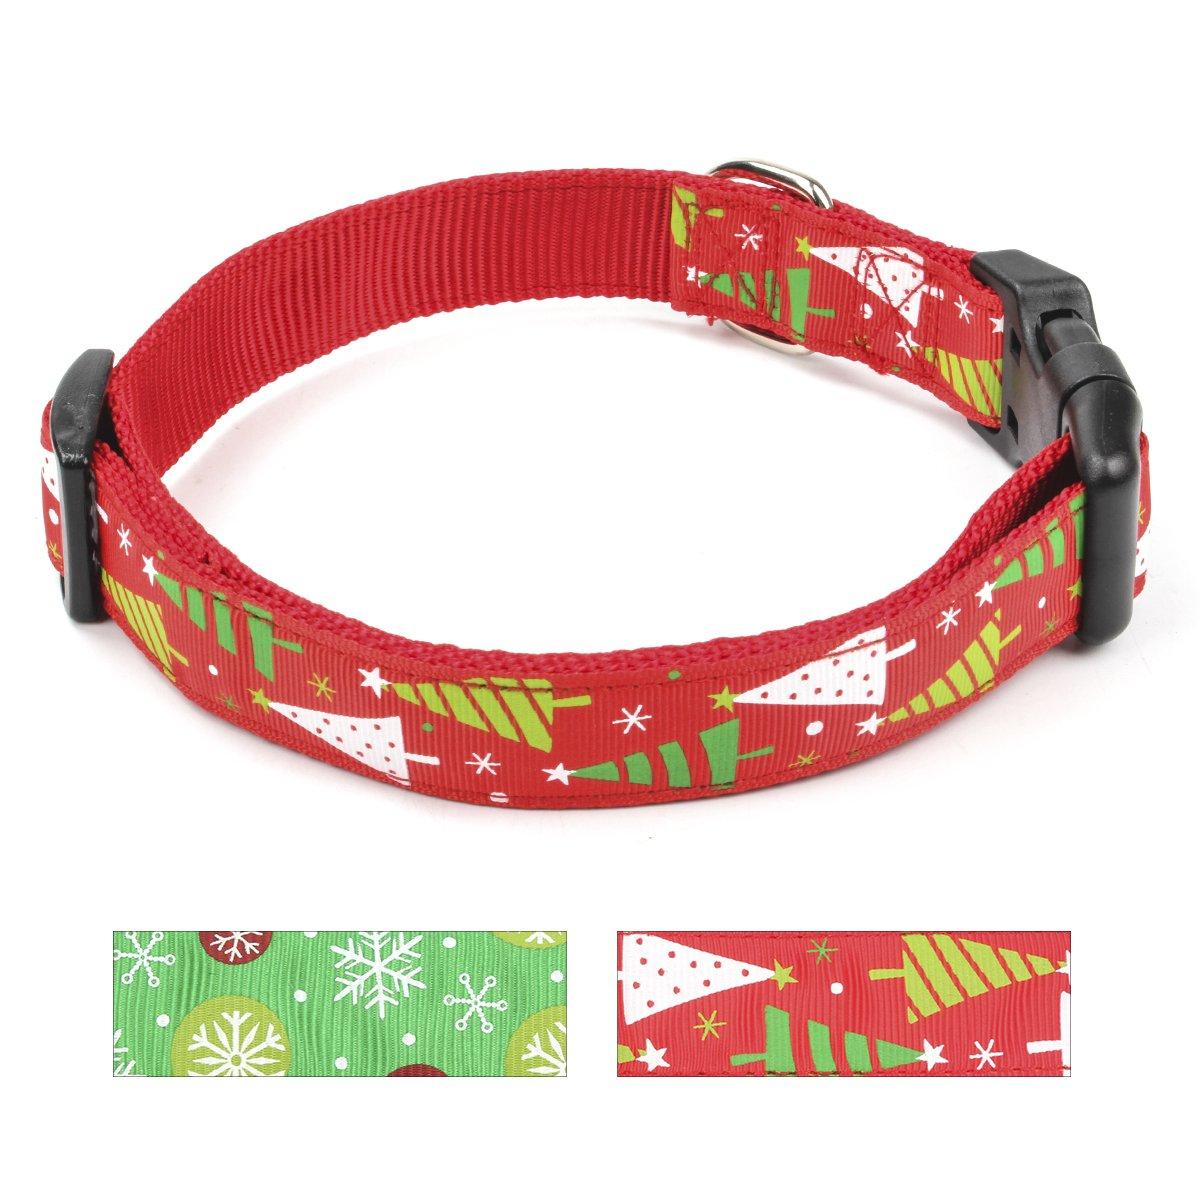 Christmas tree M Christmas tree M Ezeso Pet Dog Collar Thanksgiving Puppy Dog Collars (M, Tree)